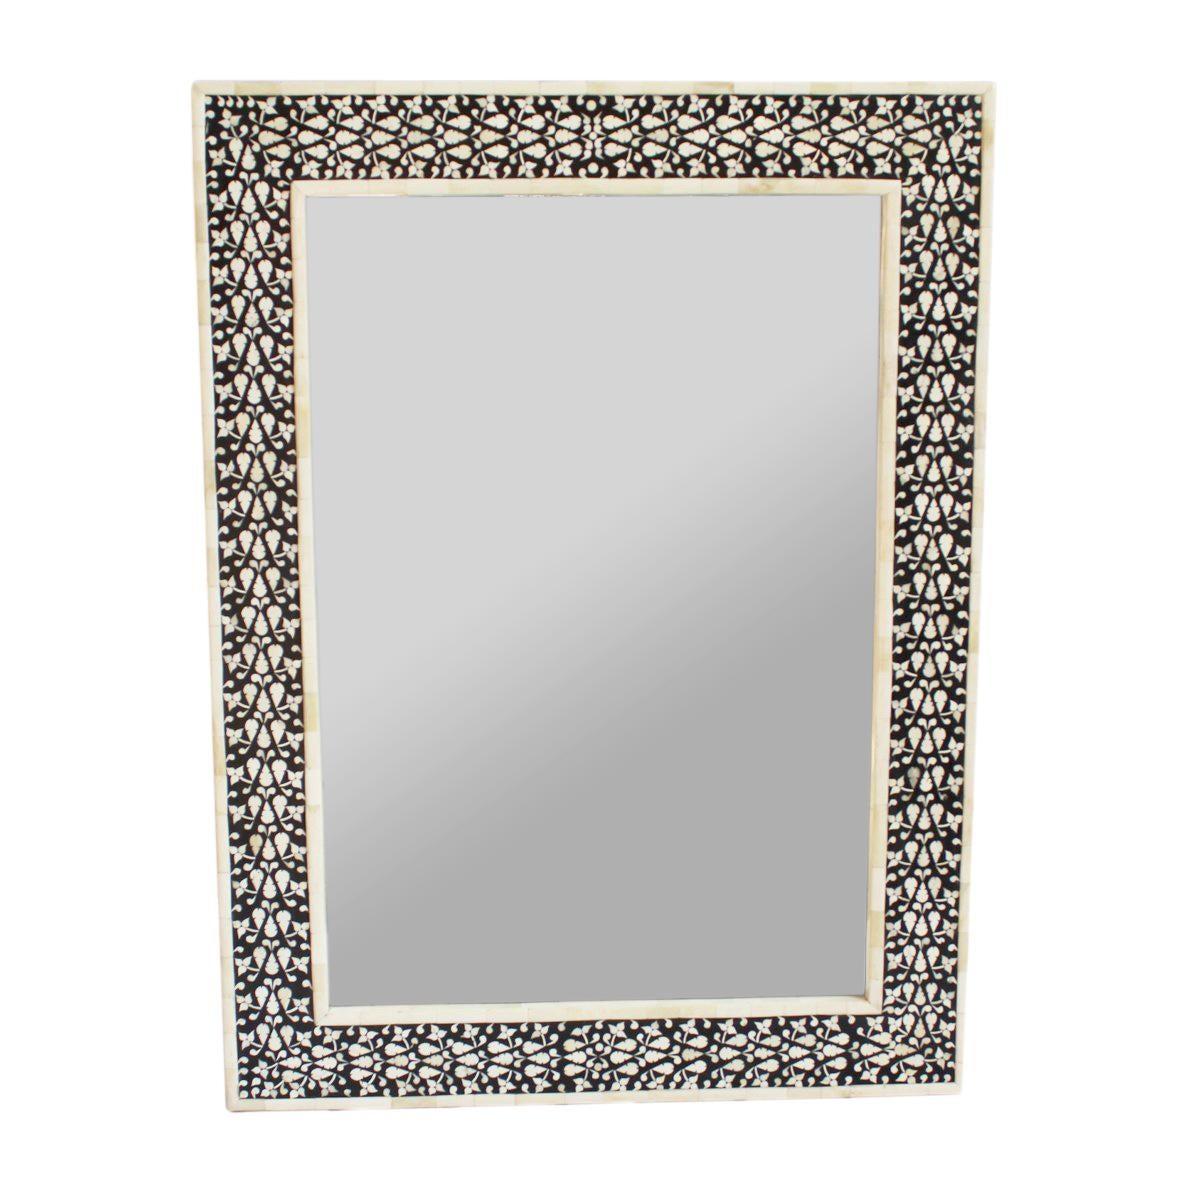 black white inlay mirror chairish. Black Bedroom Furniture Sets. Home Design Ideas